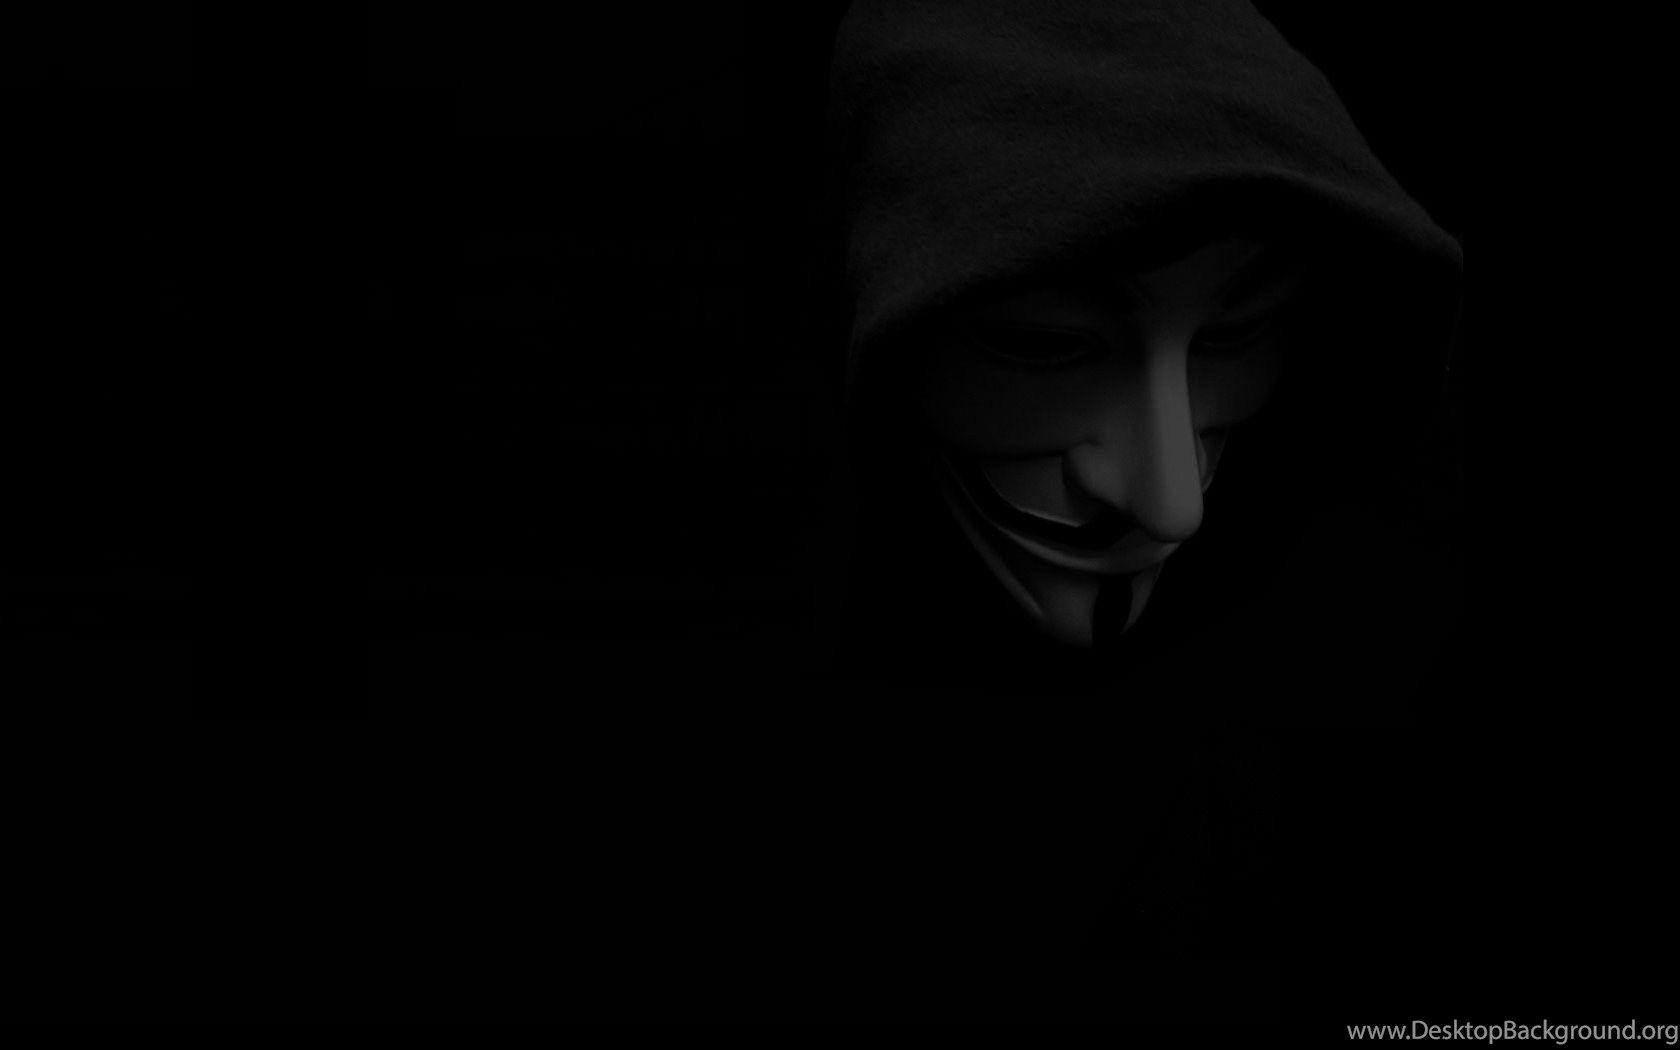 Hacker Desktop Wallpapers Top Free Hacker Desktop Backgrounds Wallpaperaccess